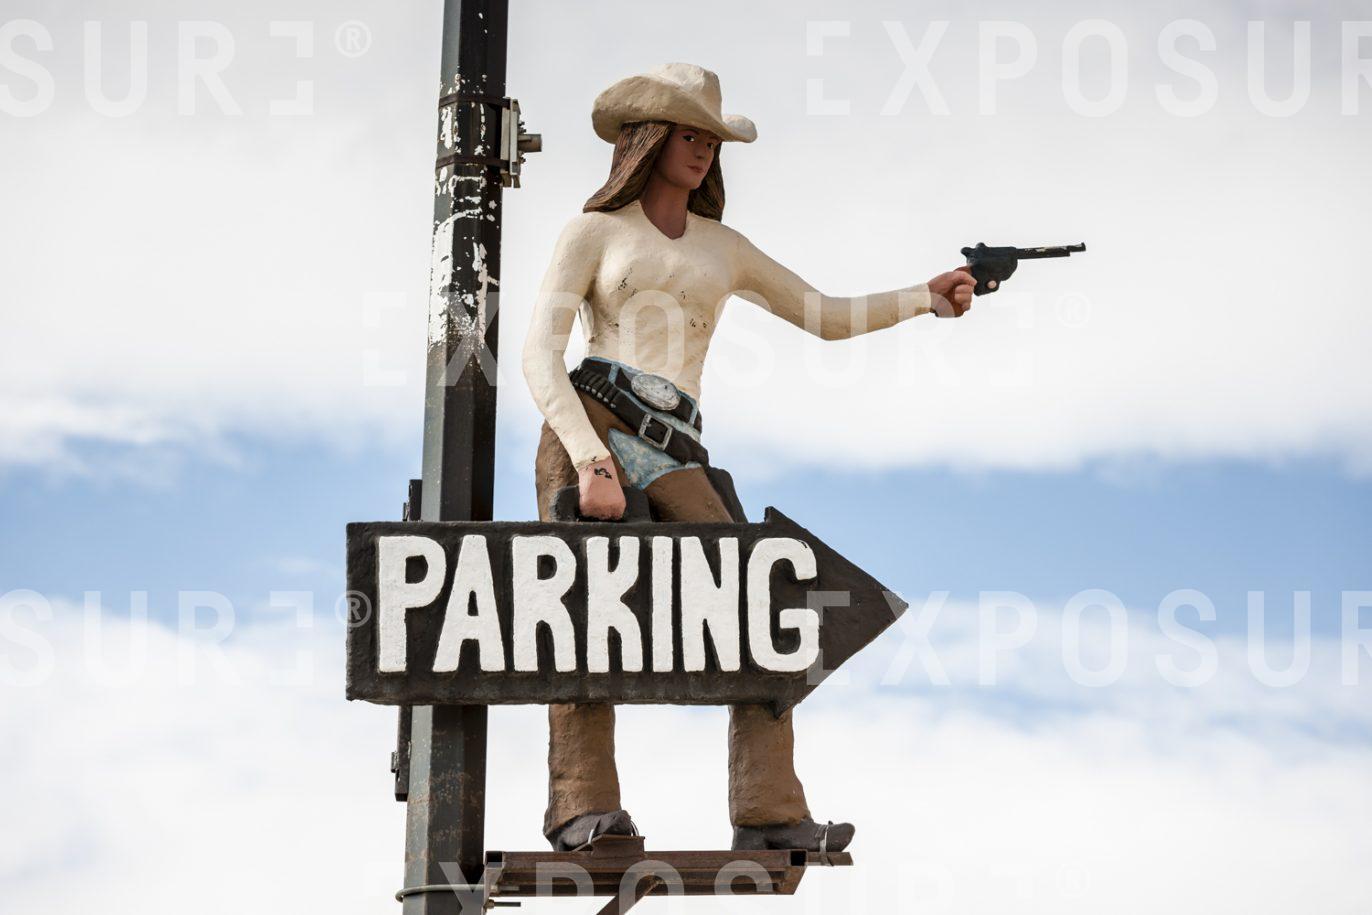 Car parking directions.